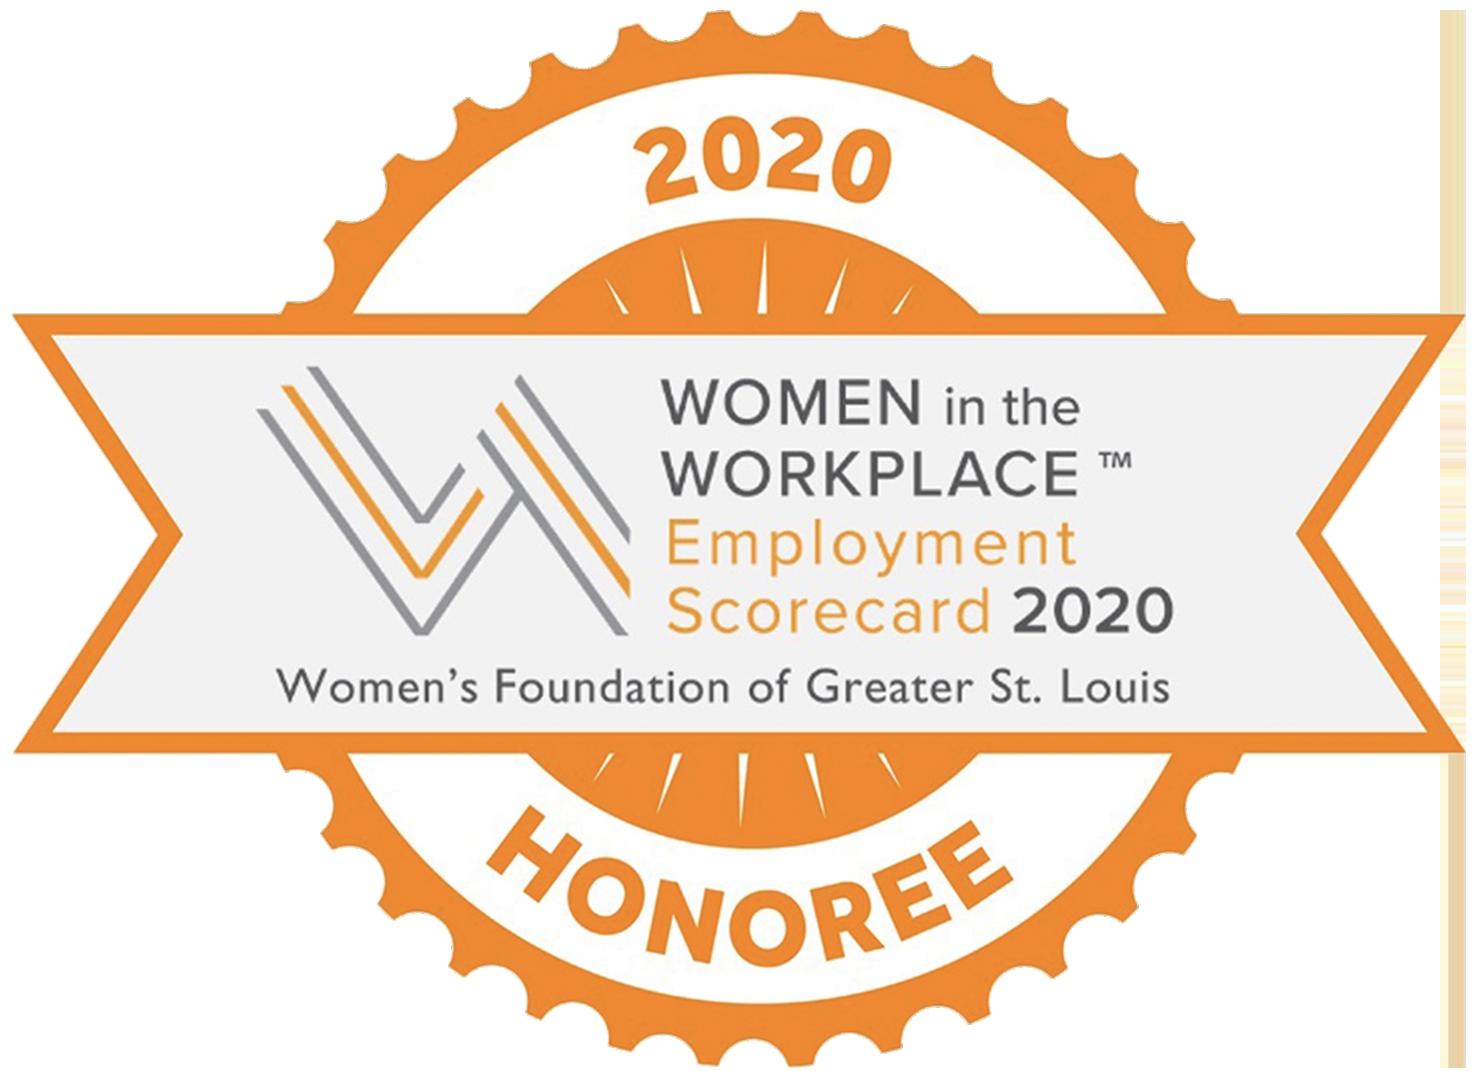 Women in the Workplace Employment Scorecard 2020